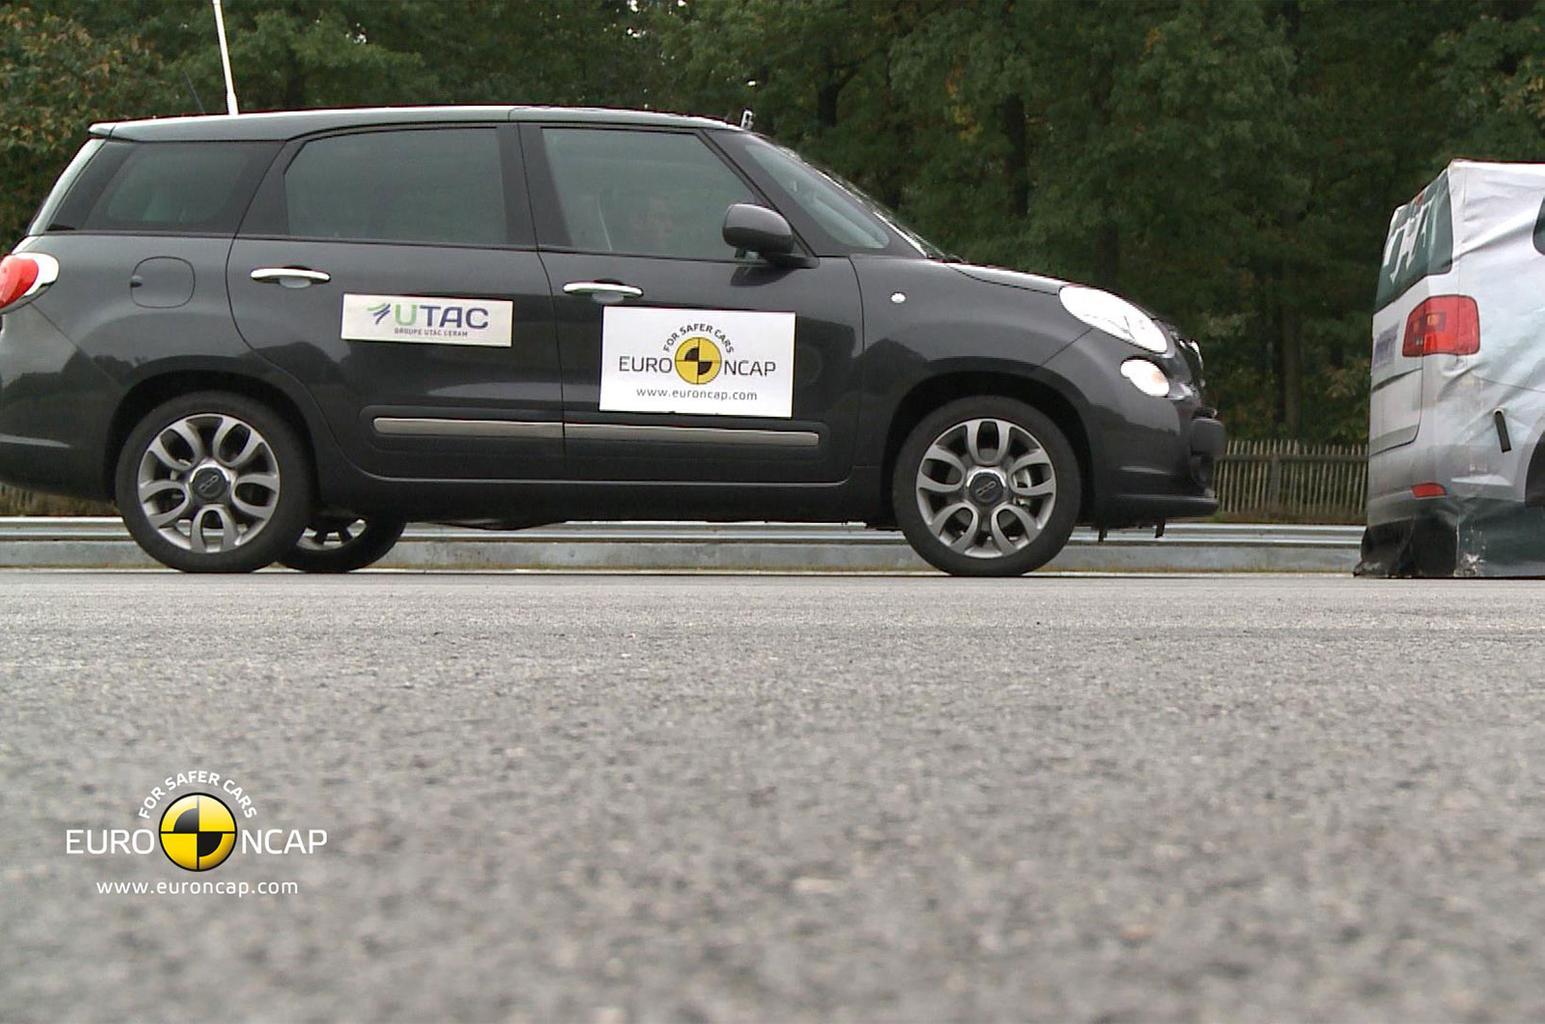 The future of Euro NCAP crash testing